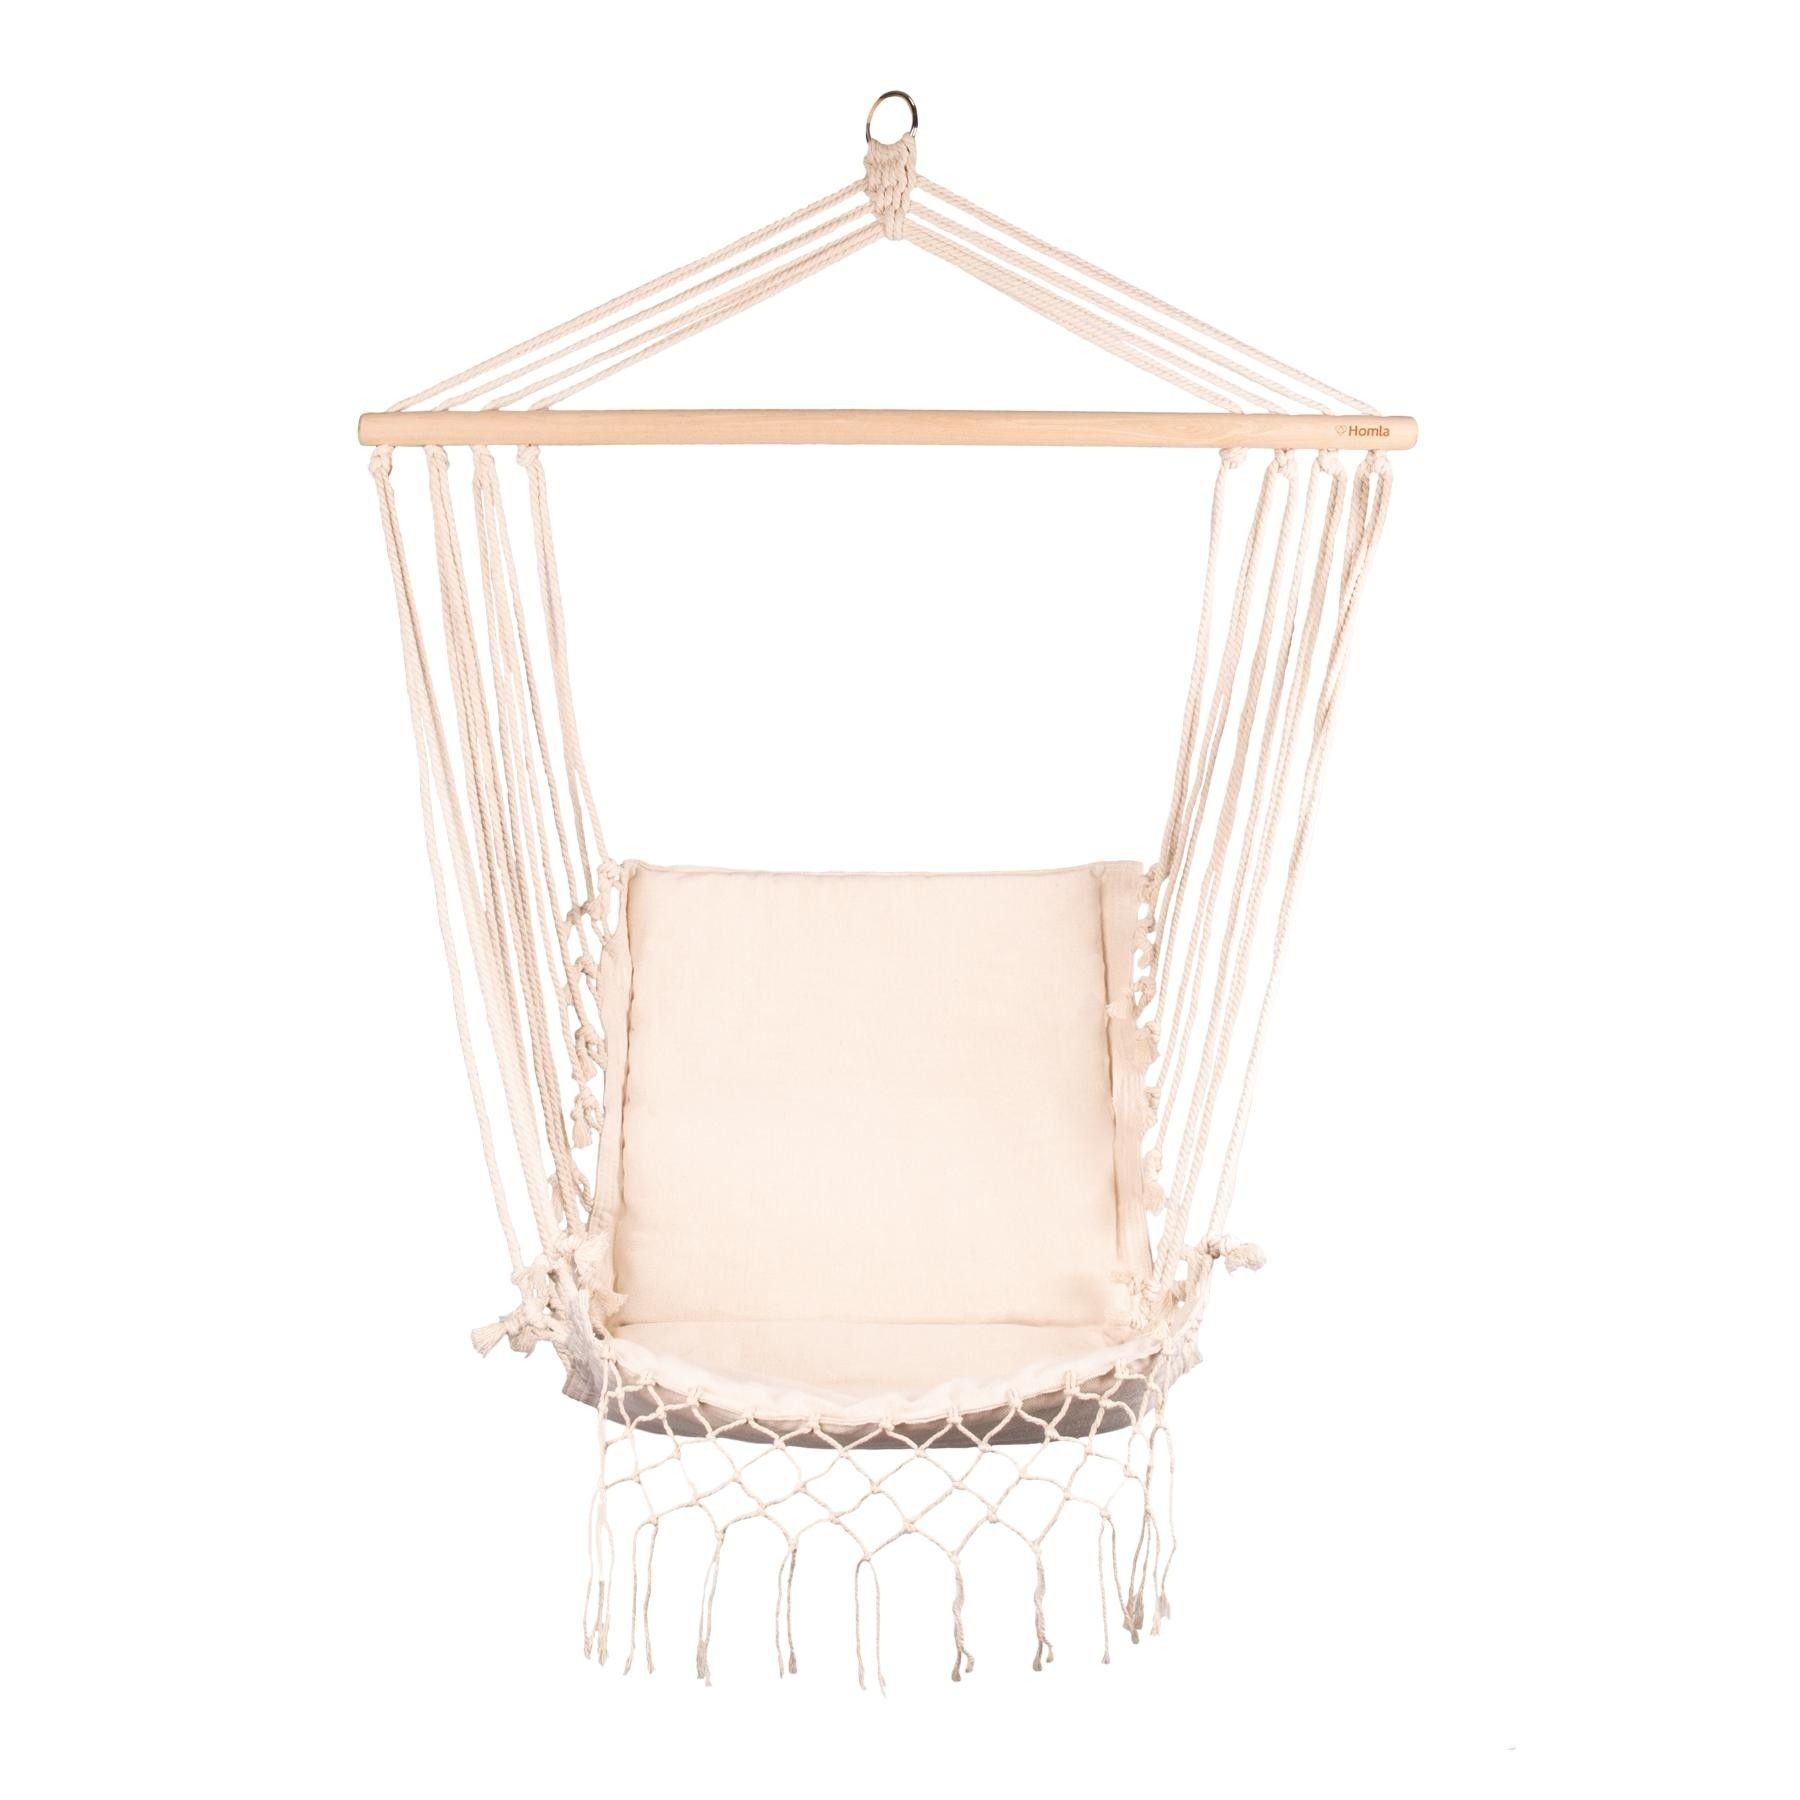 Wobble Hustawka Ecru 55x50x110 Cm Hustawki I Fotele Wiszace Meble Ogrodowe Balkon I Ogrod Homla Com Pl Hanging Chair Lamp Shade Hanging